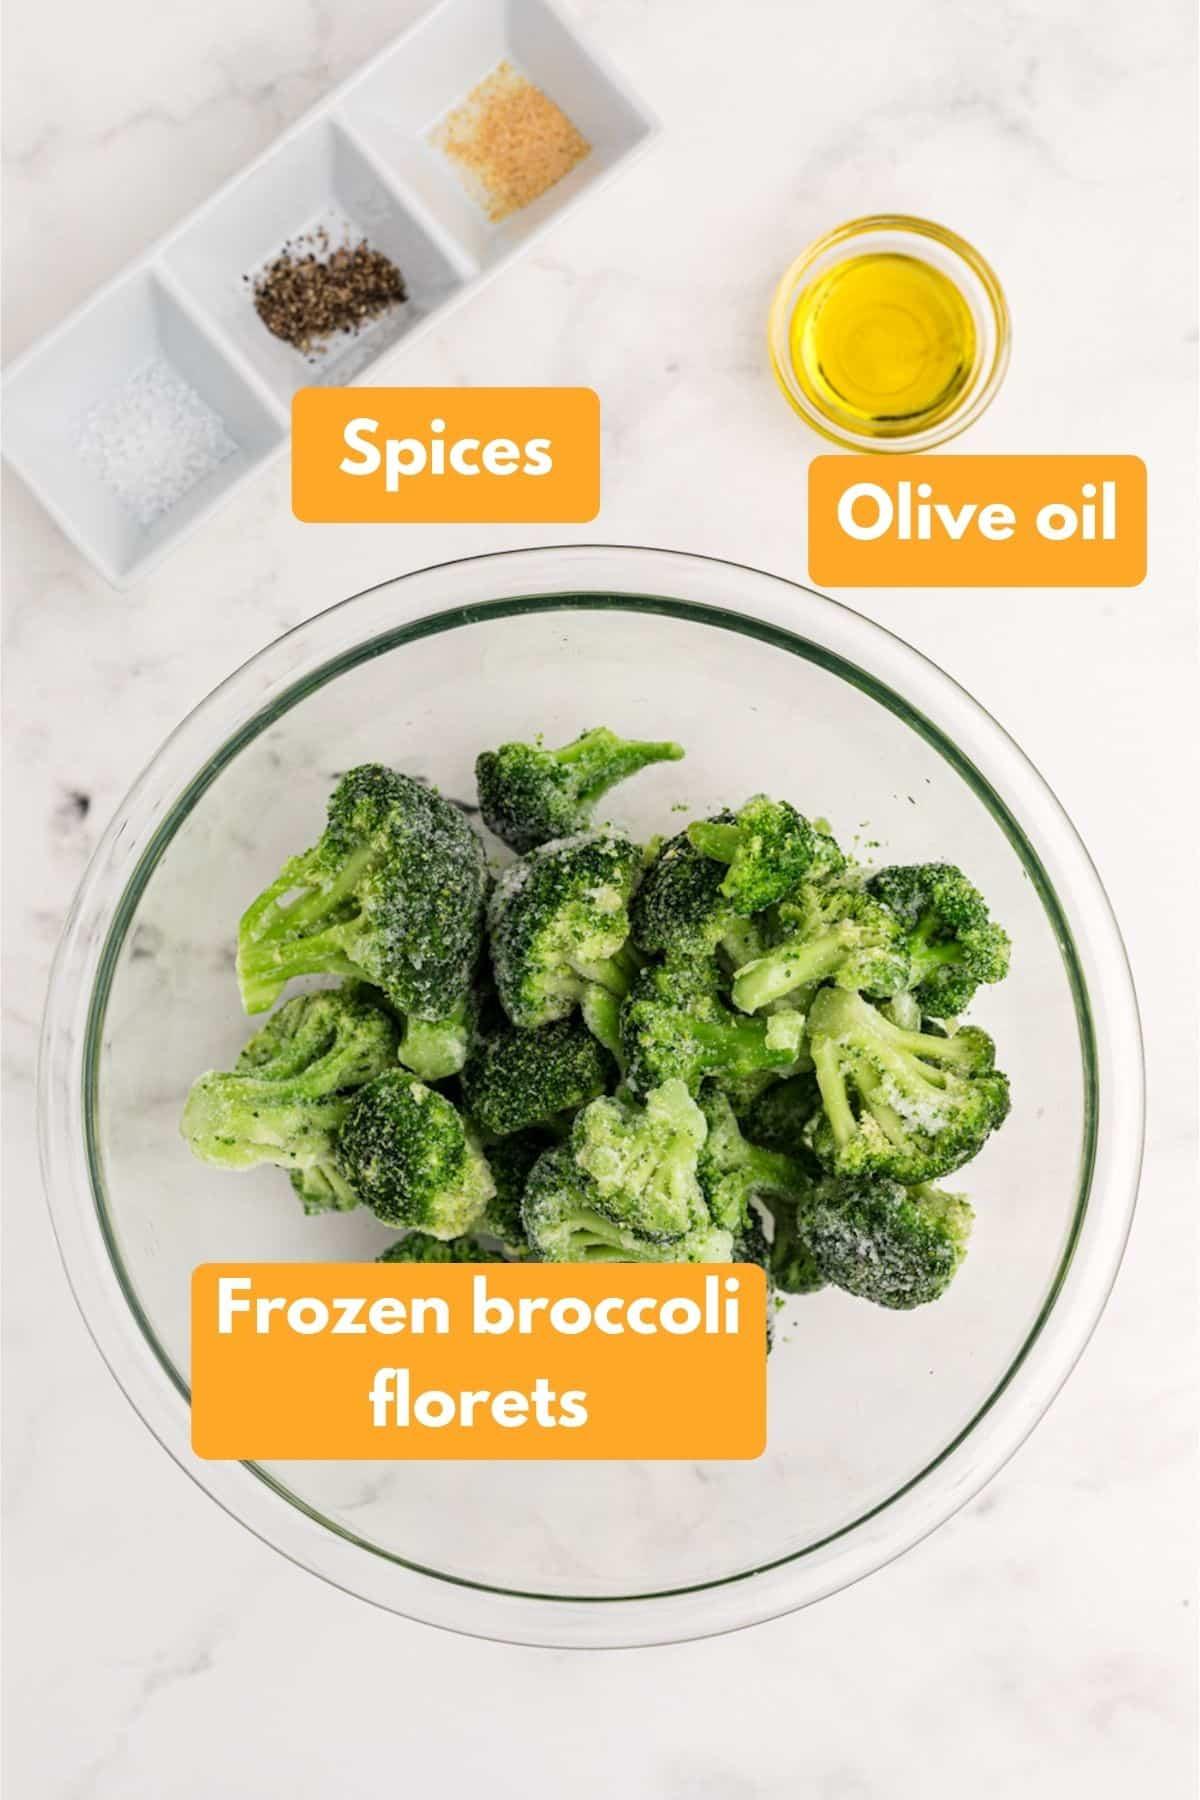 ingredients for air fryer frozen broccoli